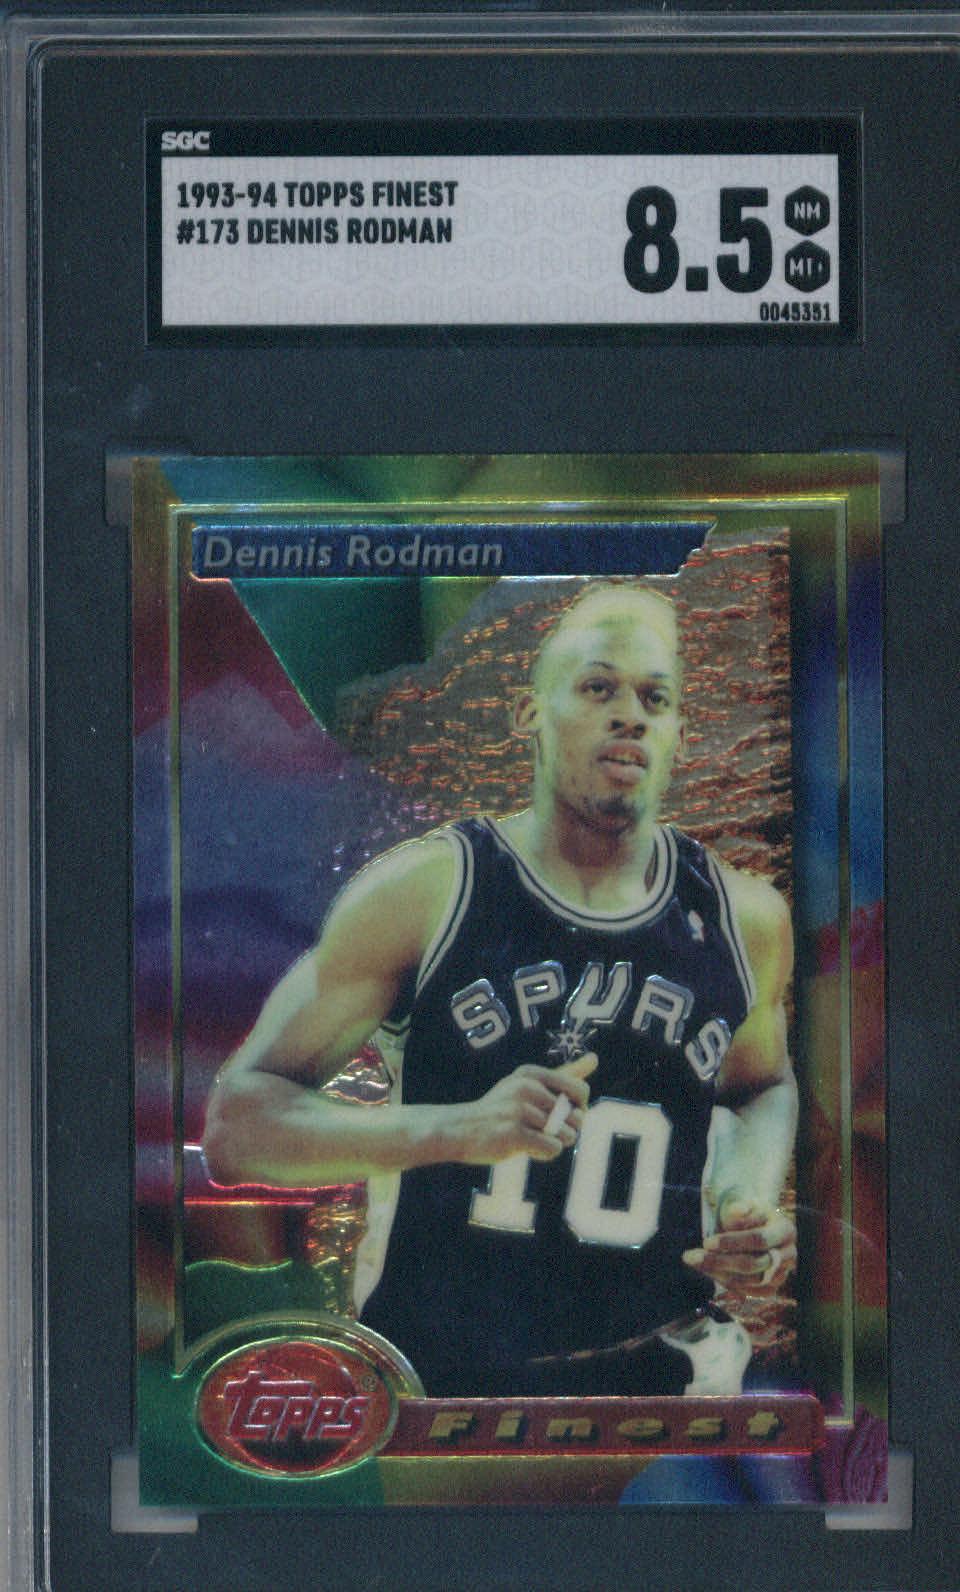 1993-94 Topps Finest #173 Dennis Rodman SGC 8.5